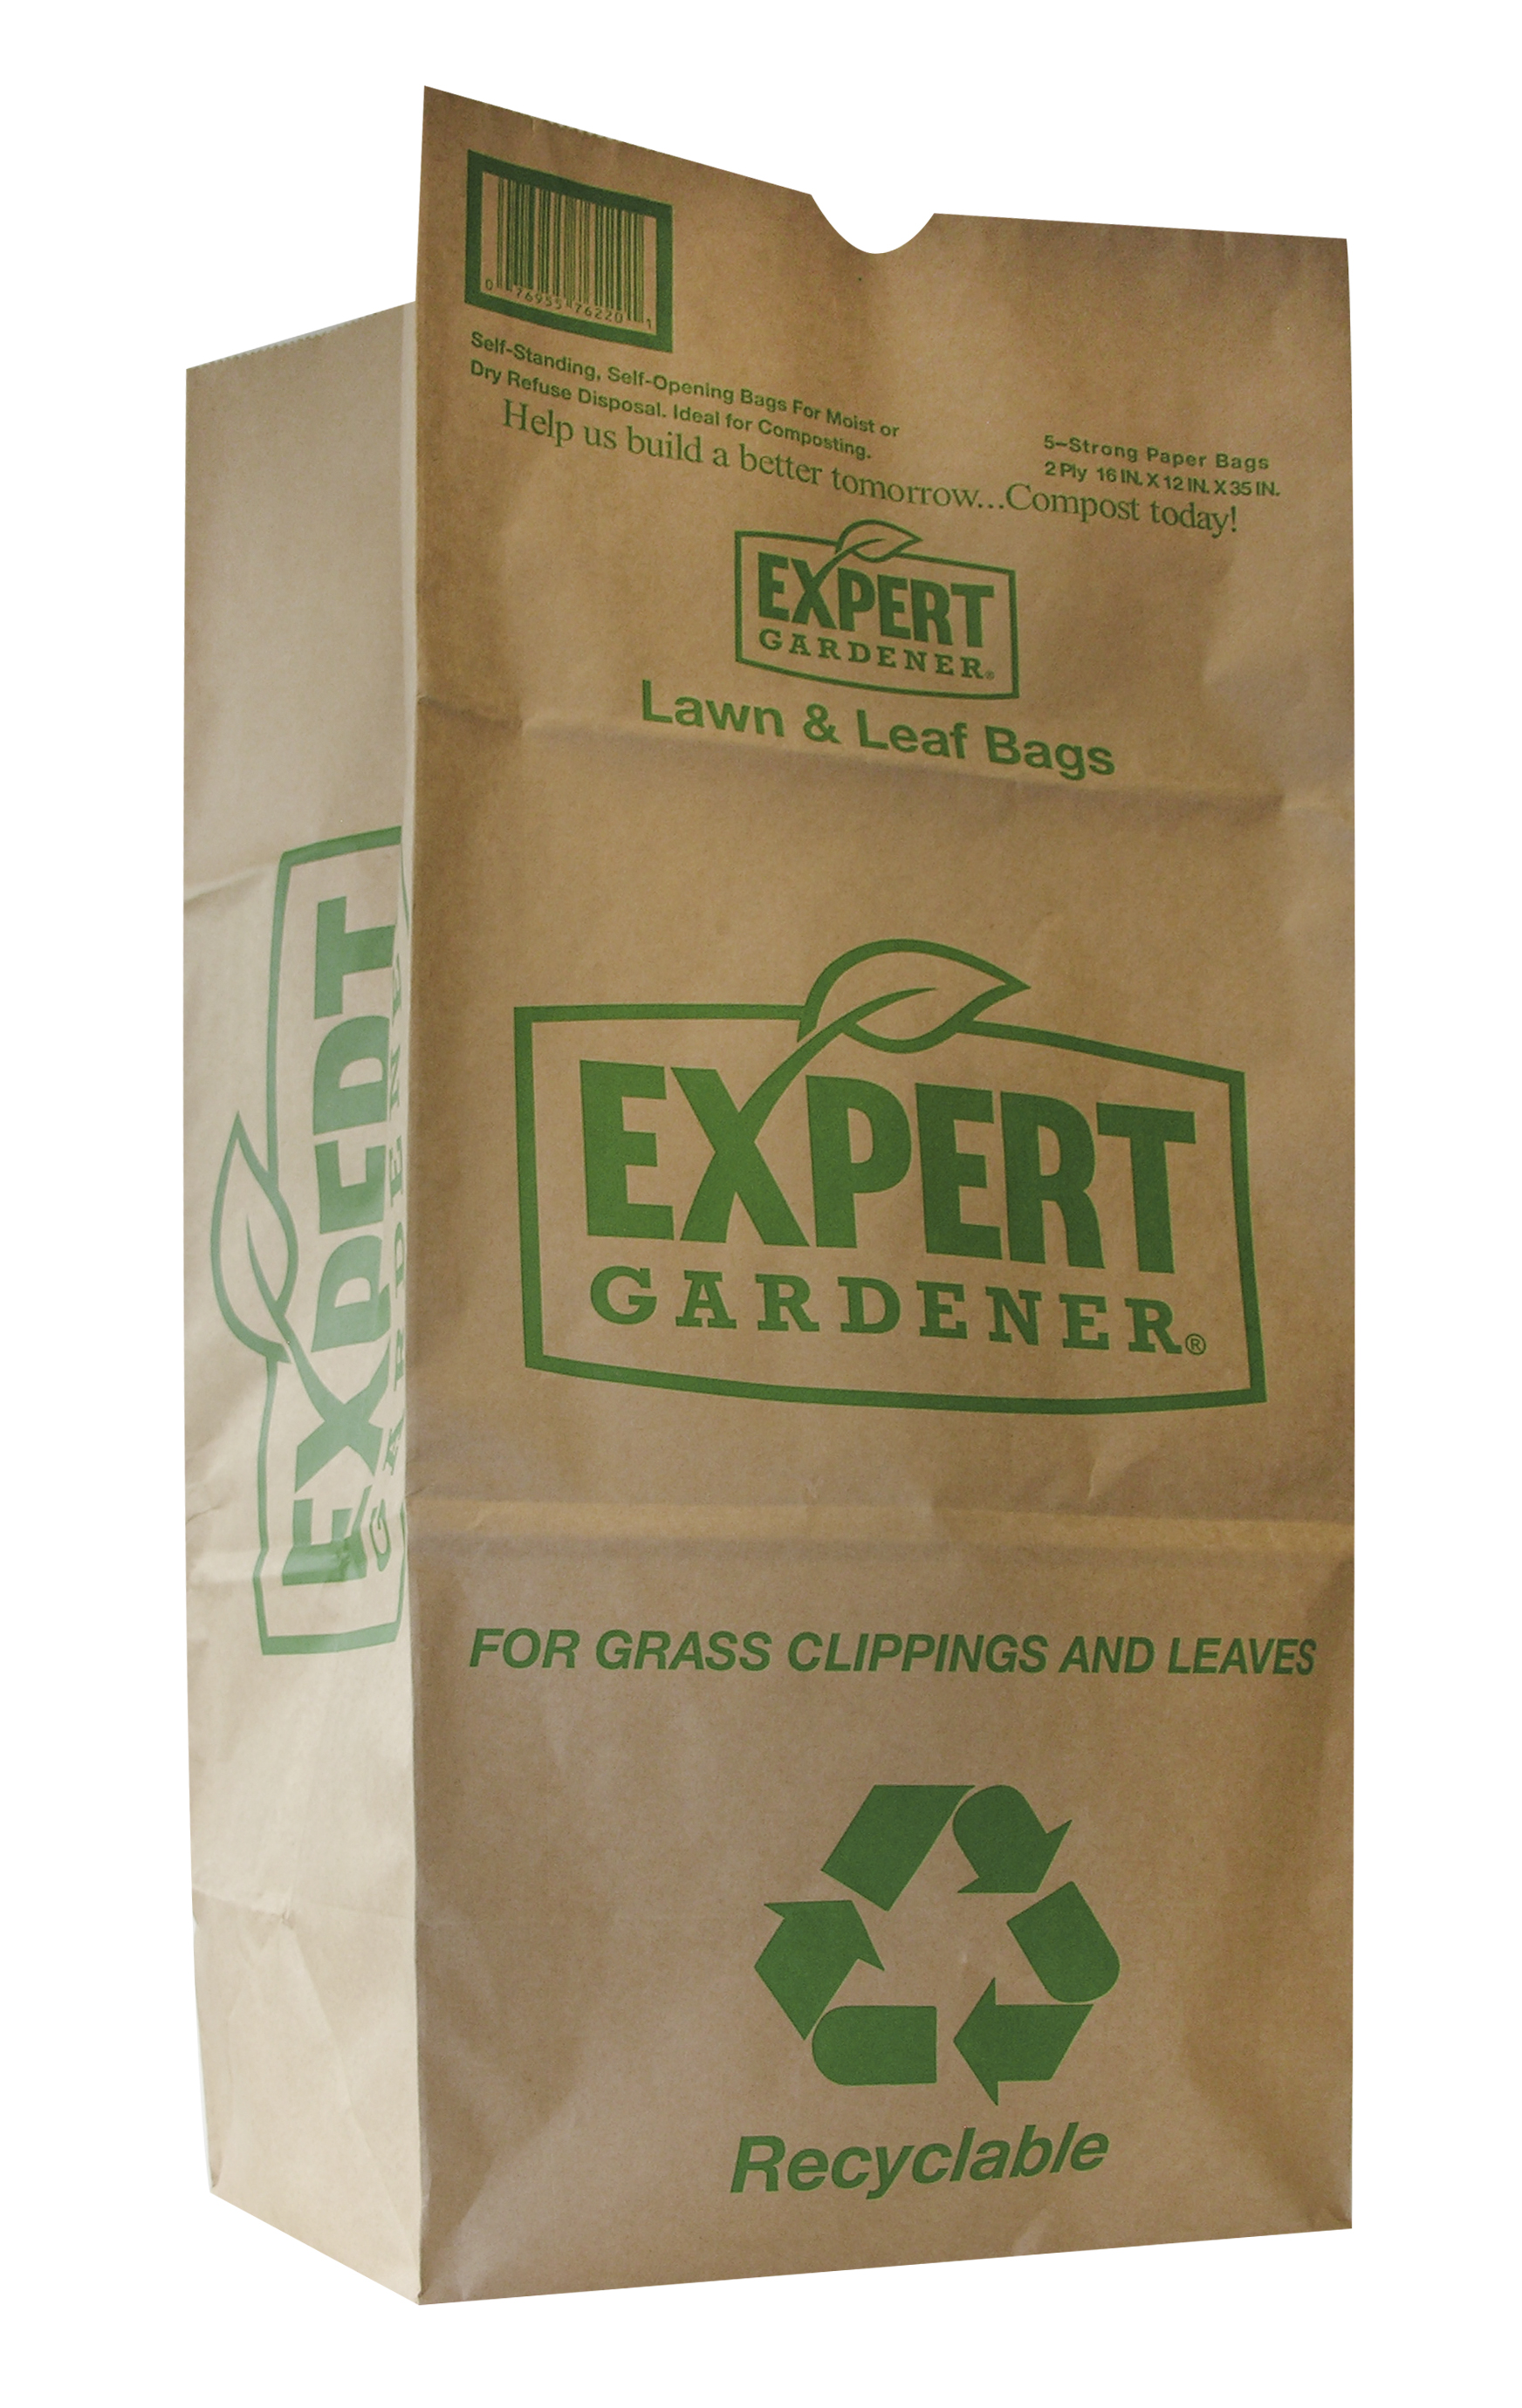 Expert Gardener Lawn Bag 30 Gallon